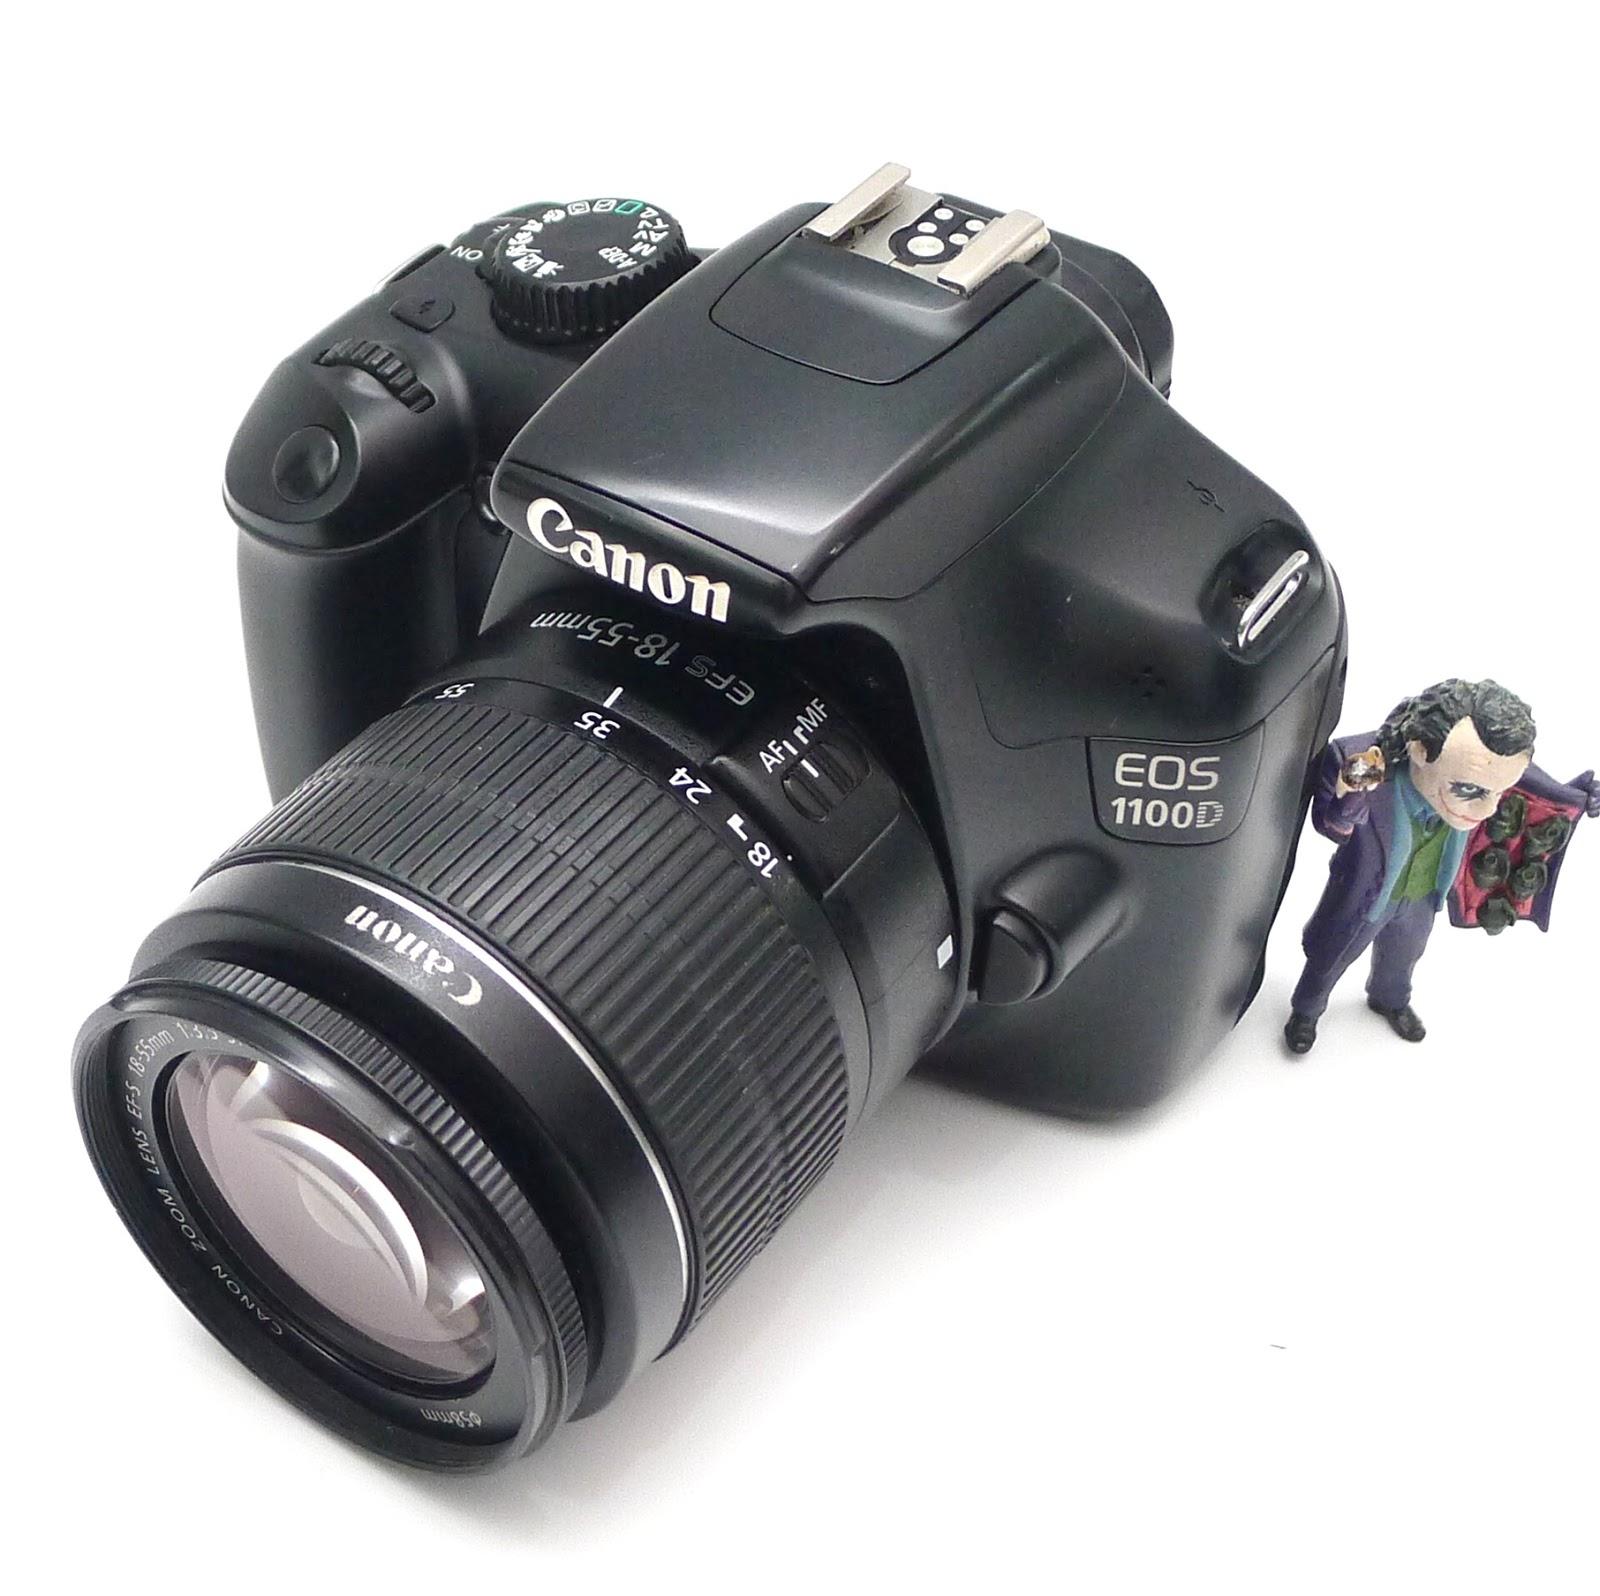 Jual Kamera Dslr Canon Eos 1100d Bekas Jual Beli Laptop Bekas